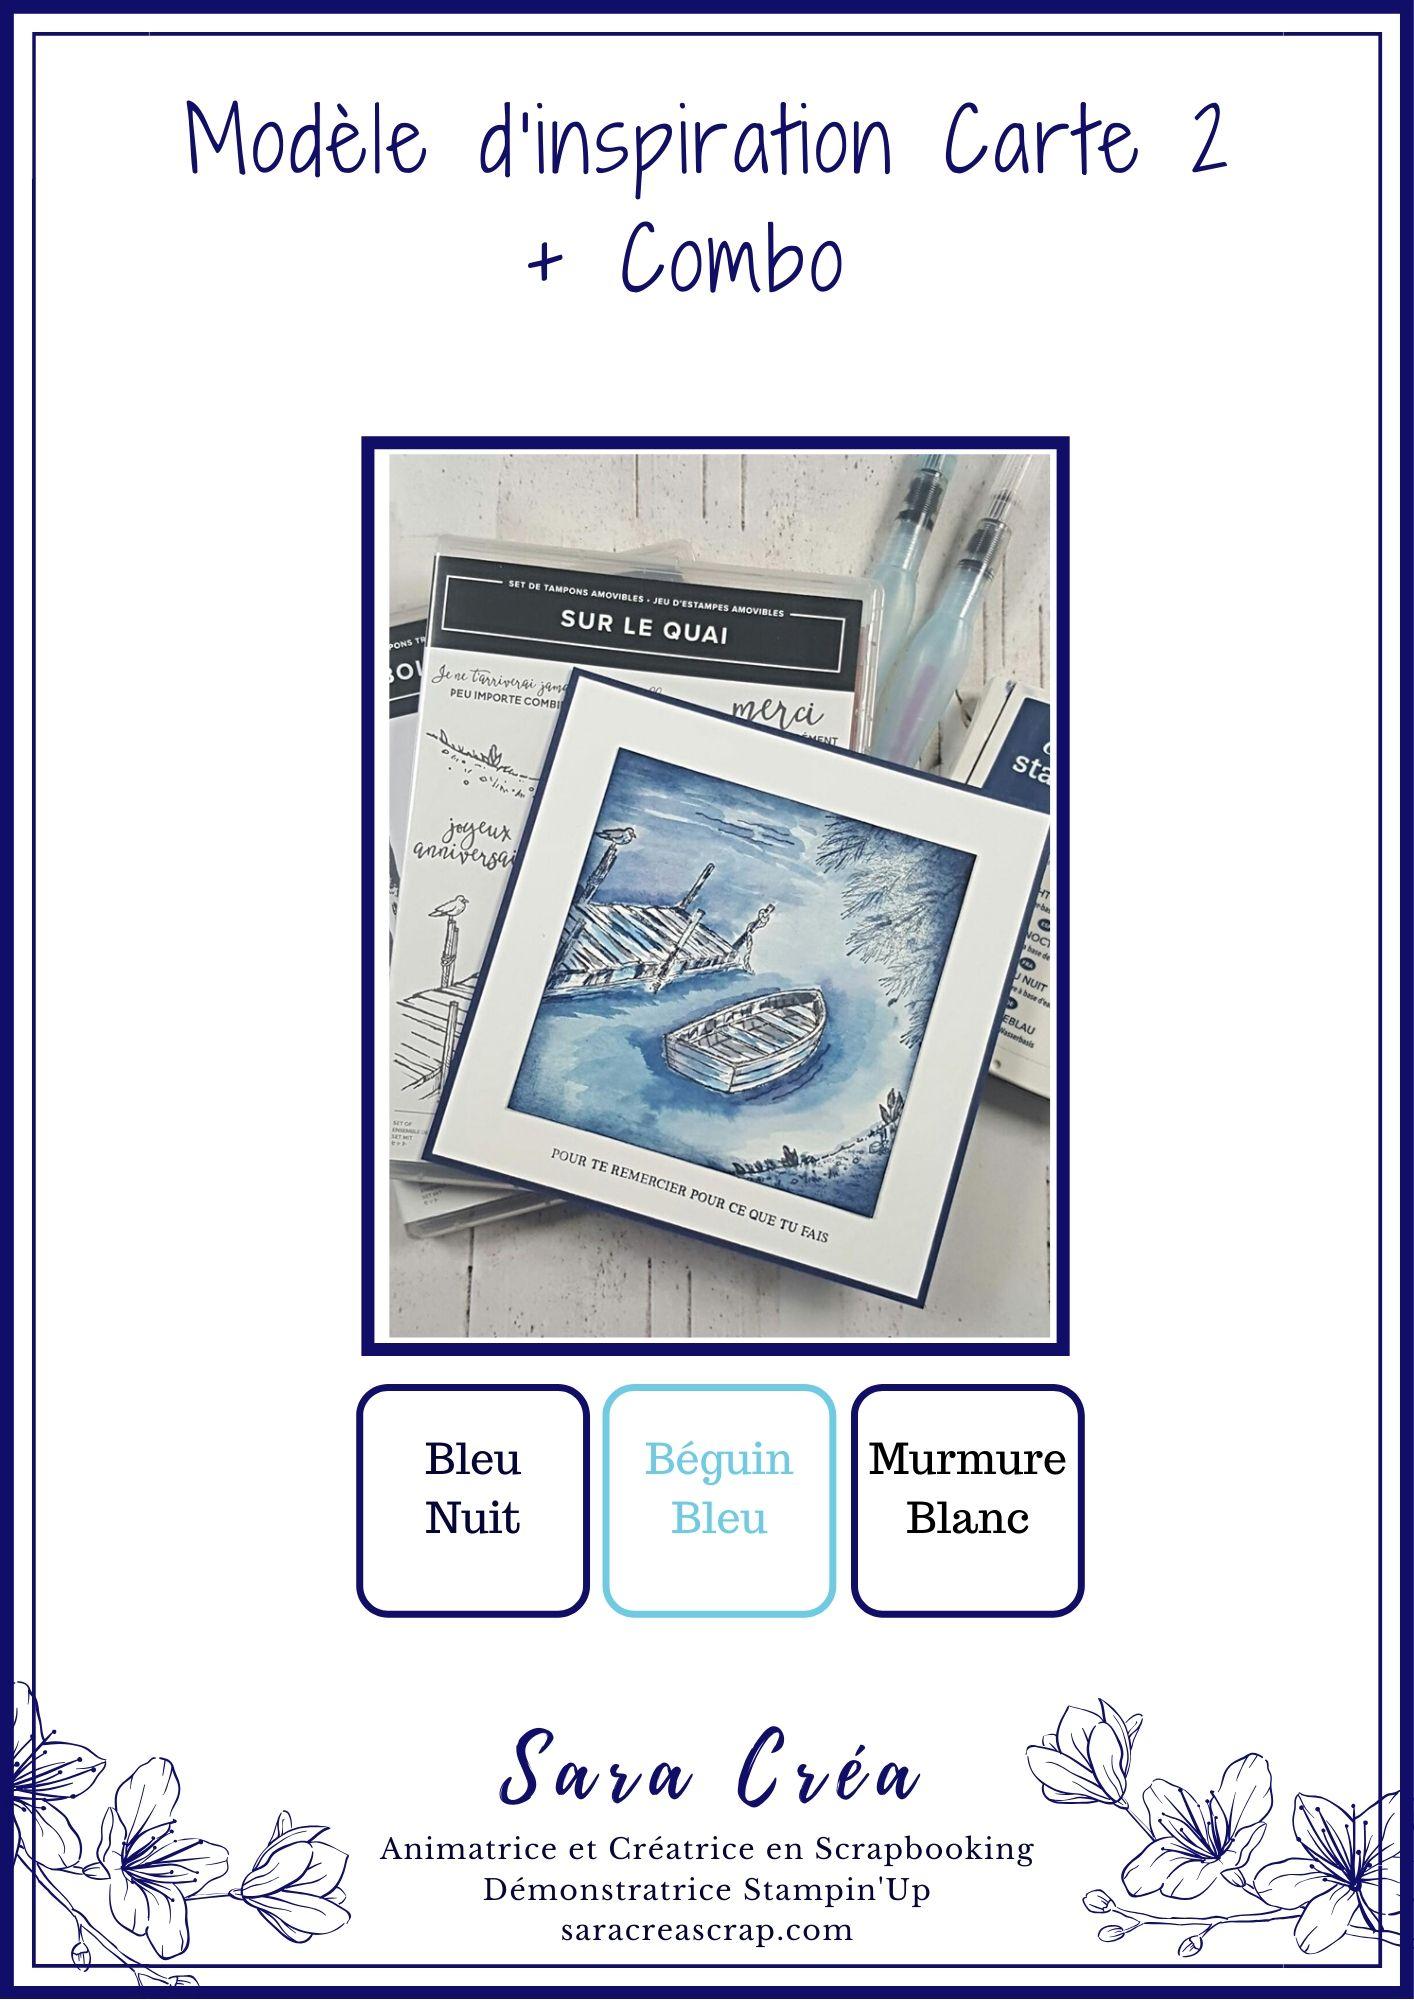 inspiration 2 carte sur le quai stampin up saracreascrap